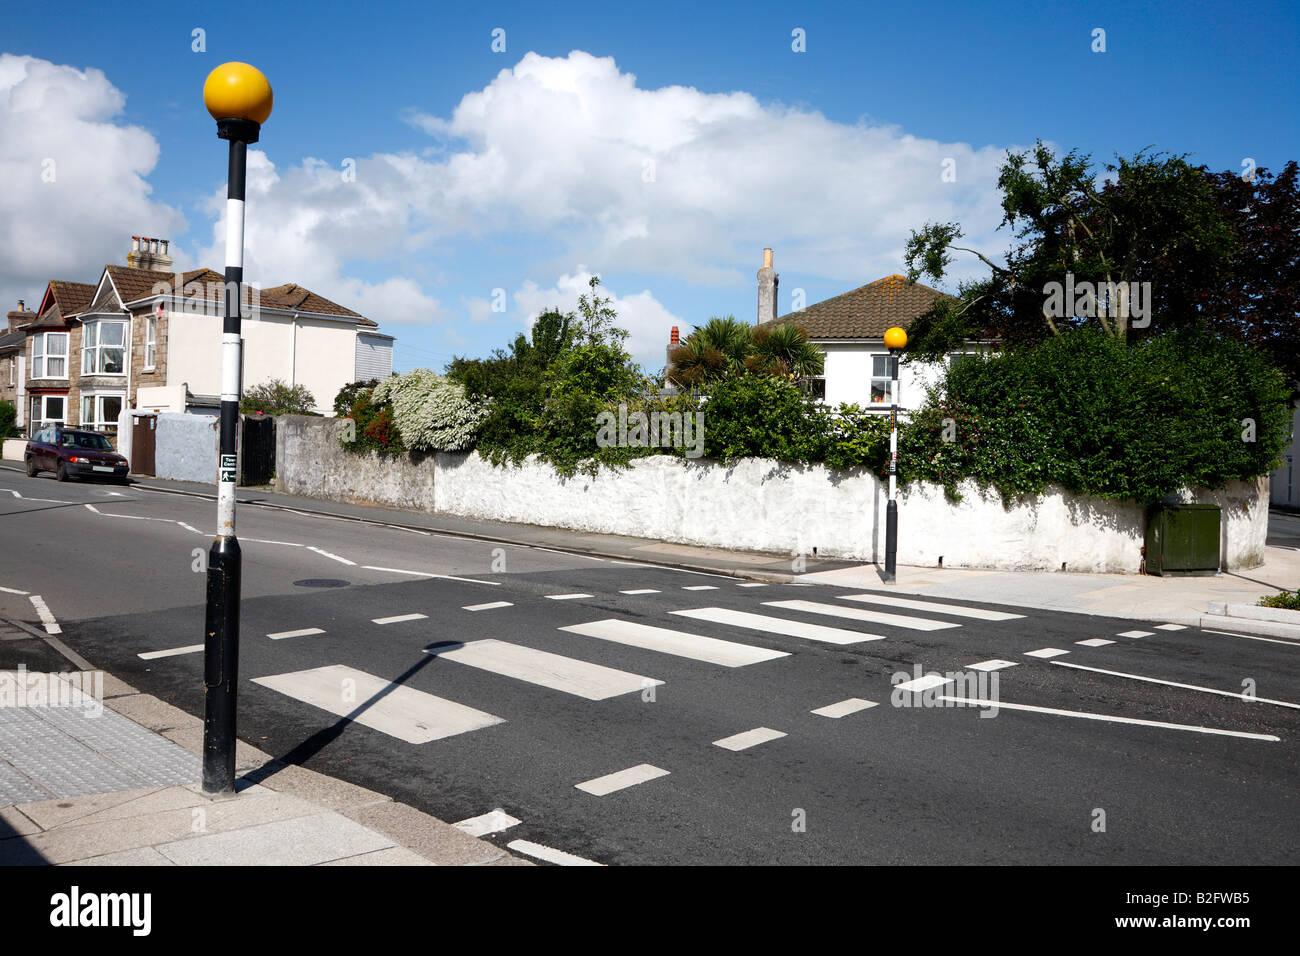 British Zebra pedestrian road crossing. Stock Photo